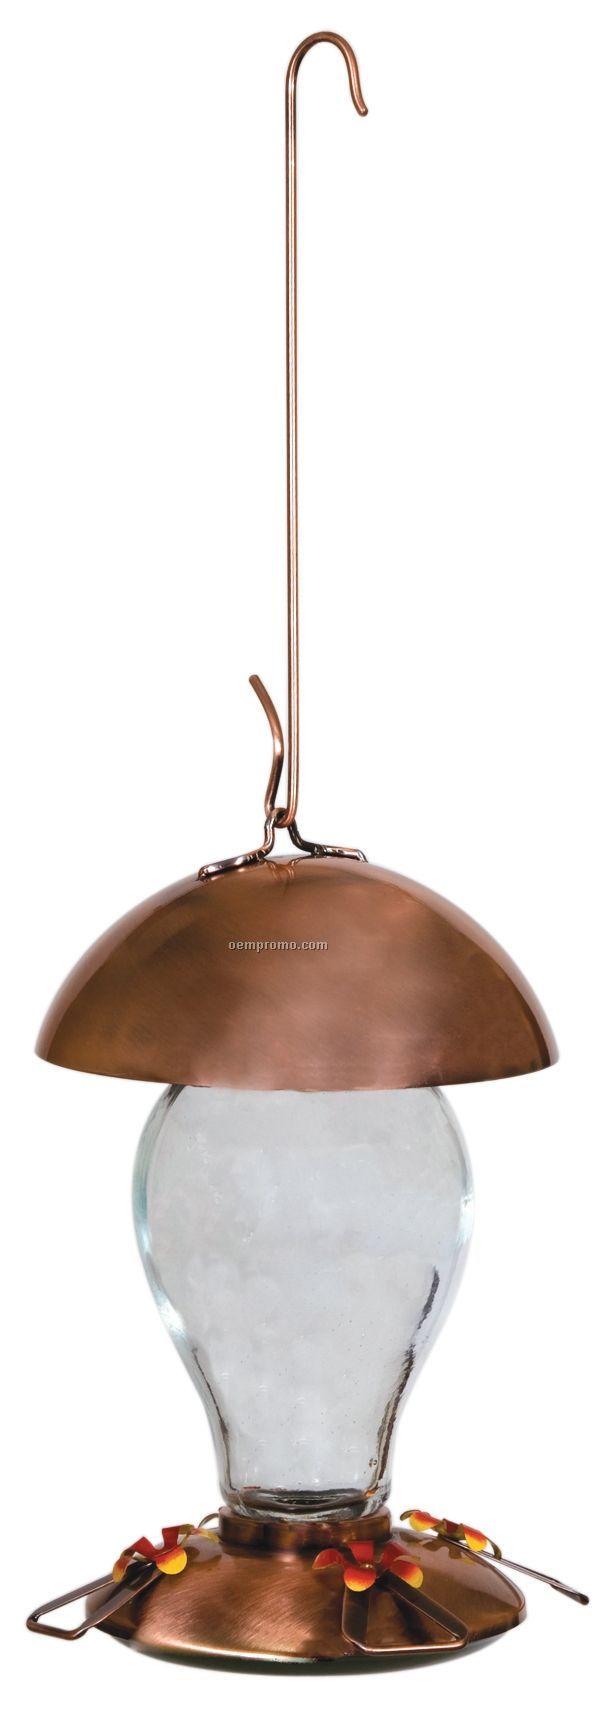 Gardman Copper Hummingbird Feeder